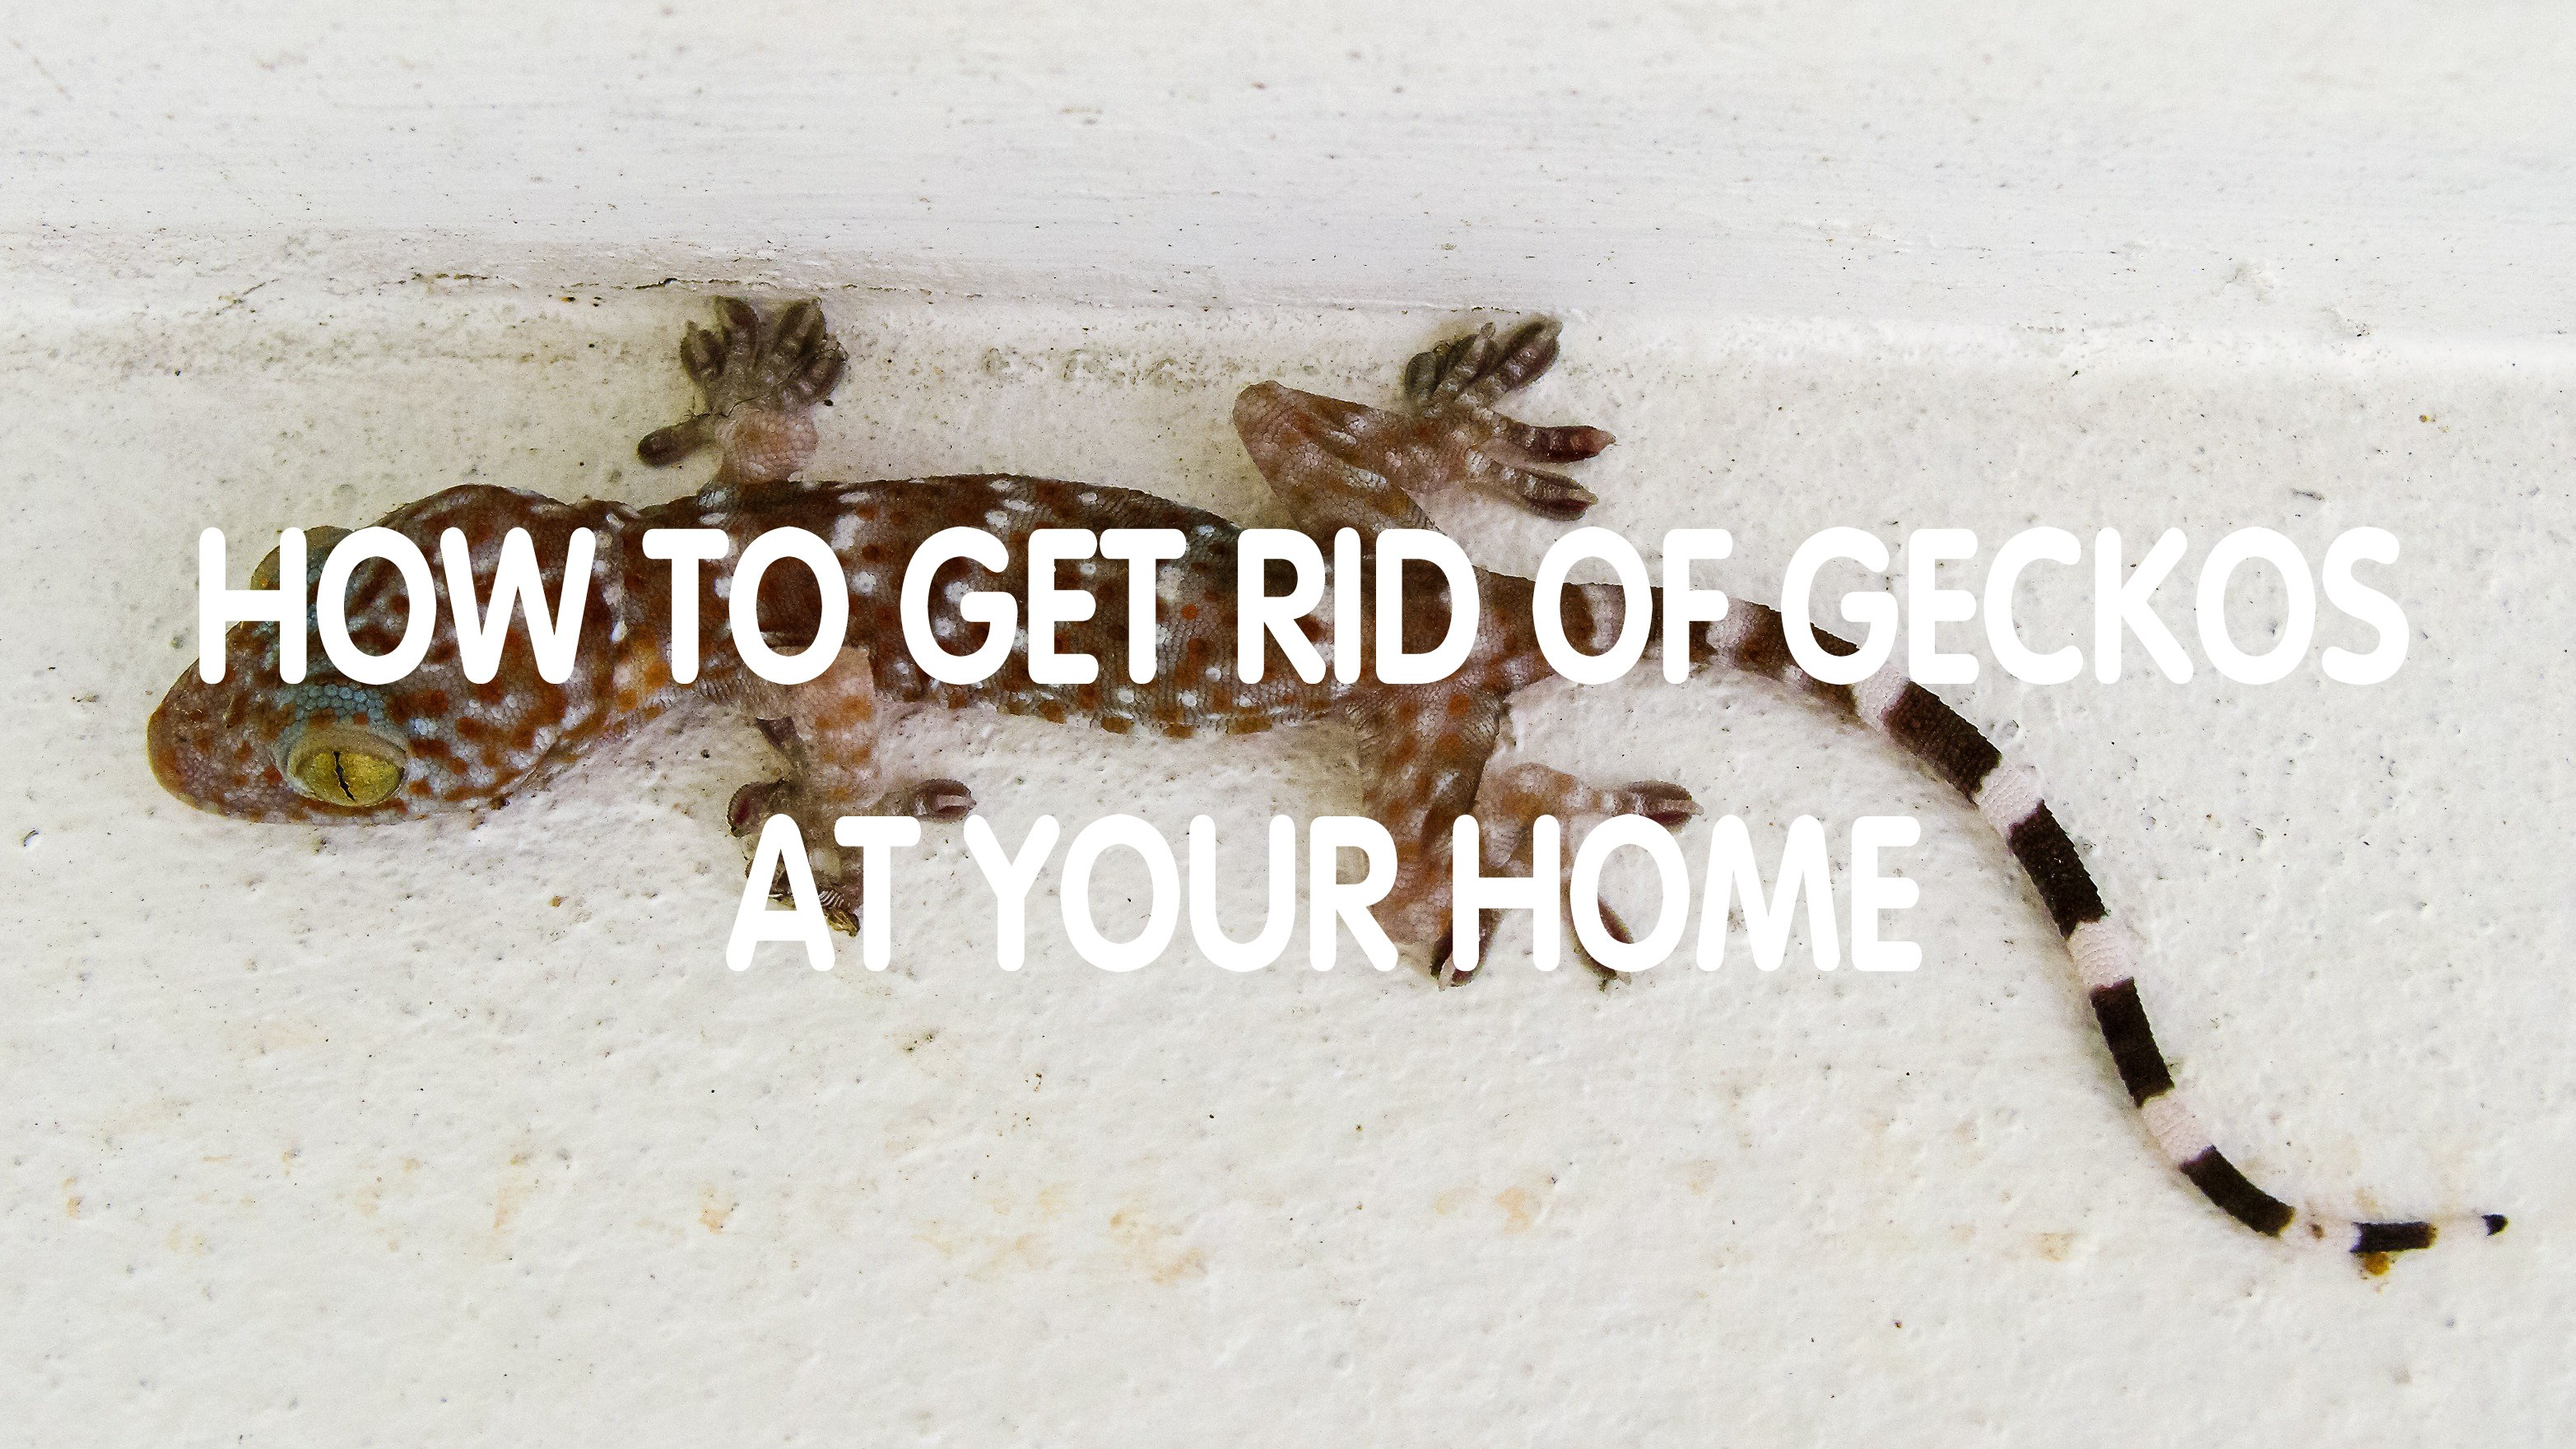 15 DIY Ways to Control Geckos Naturally (Homemade Remedies) - Pest Wiki